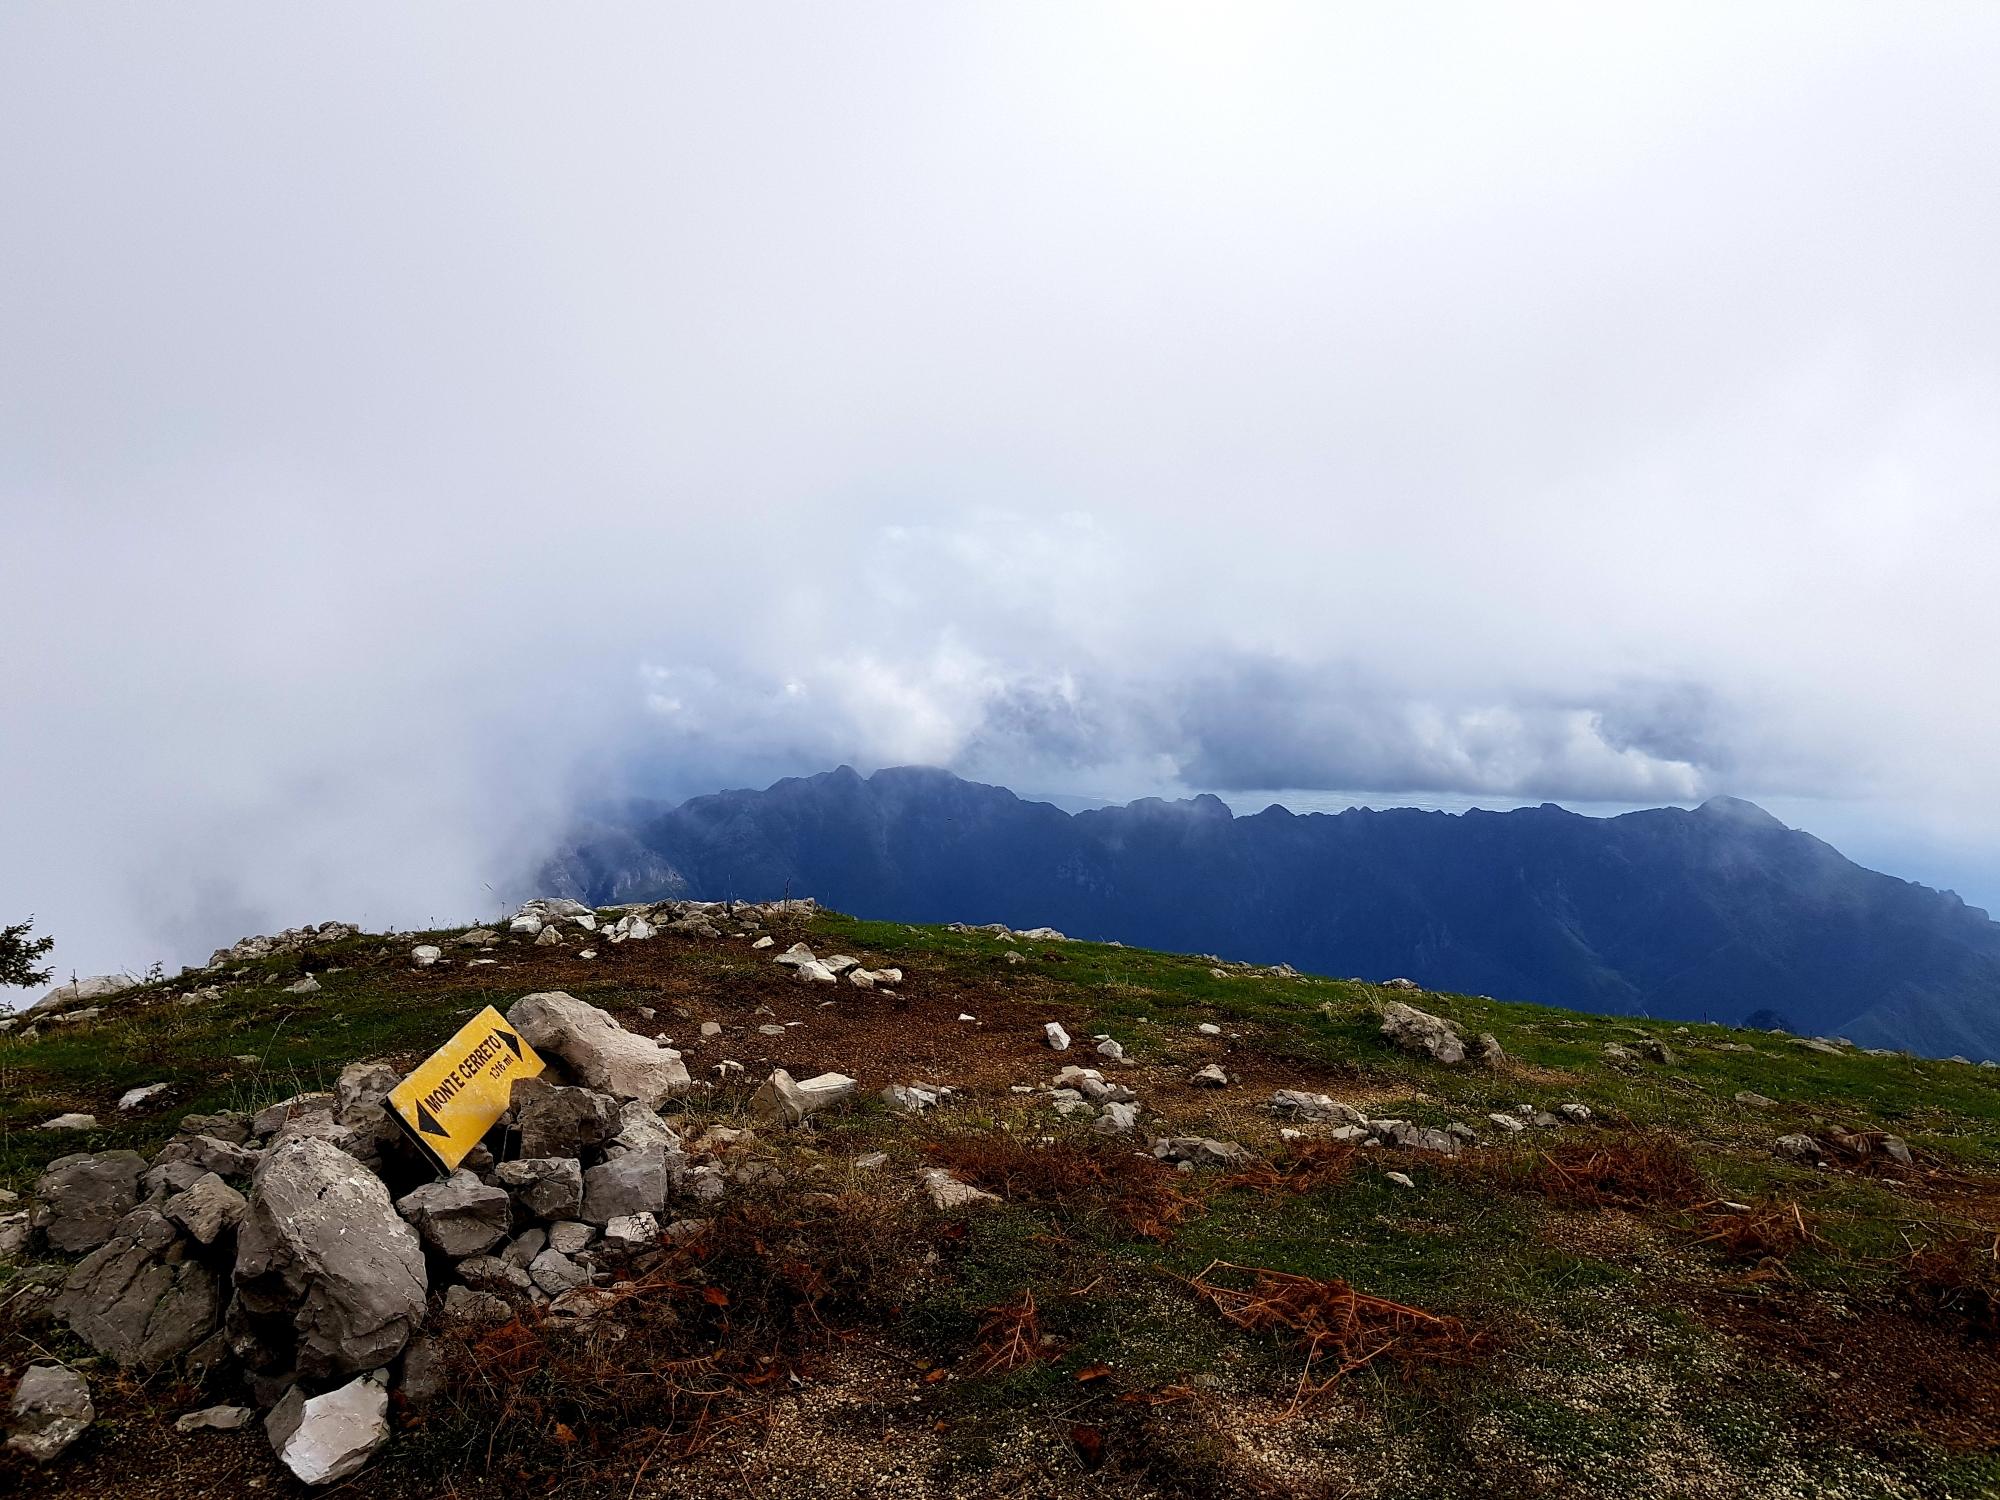 Wolkenverhangenes Gipfelplateau des Monte Cerreto